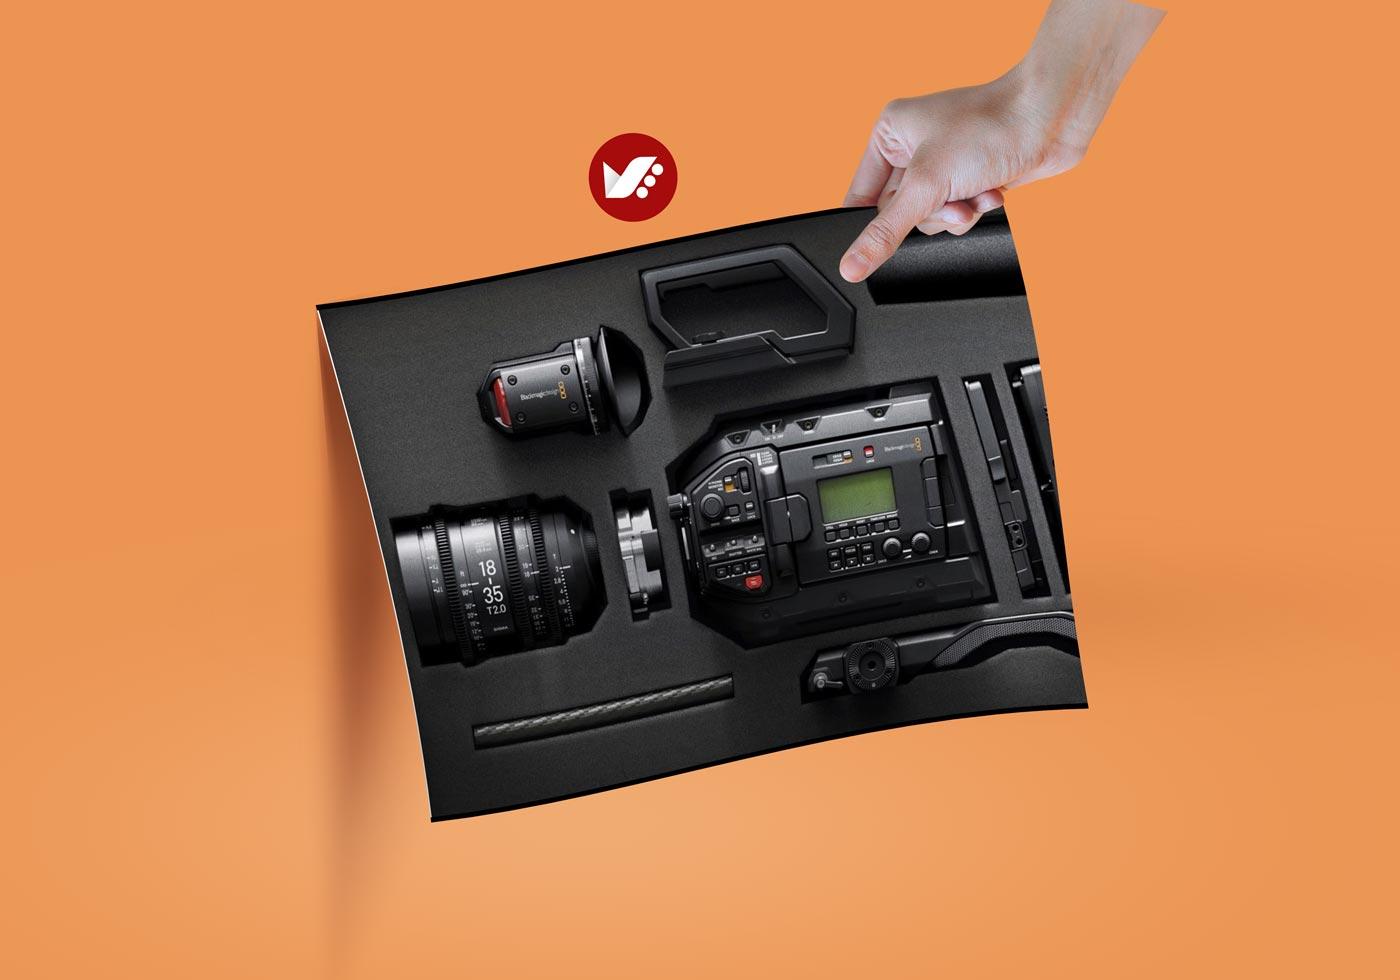 cameras - شاتر پرده جلو الکترونیکی